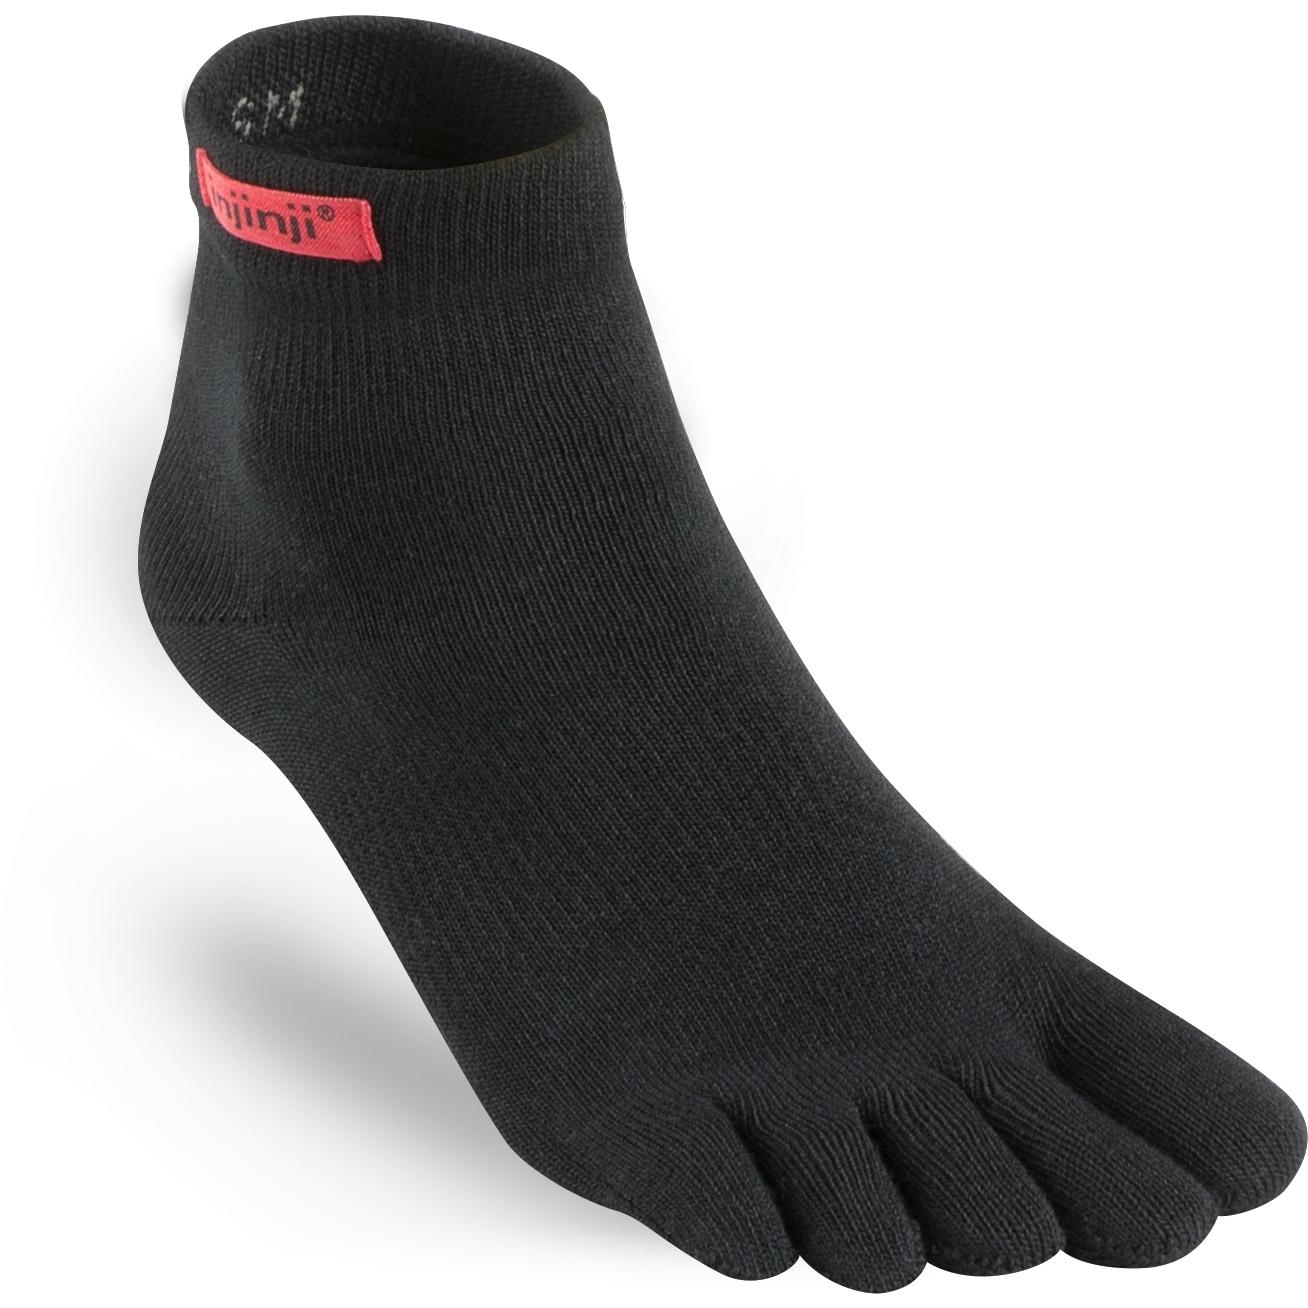 Injinji Sport Original Weight Mini-Crew Coolmax Socken - schwarz